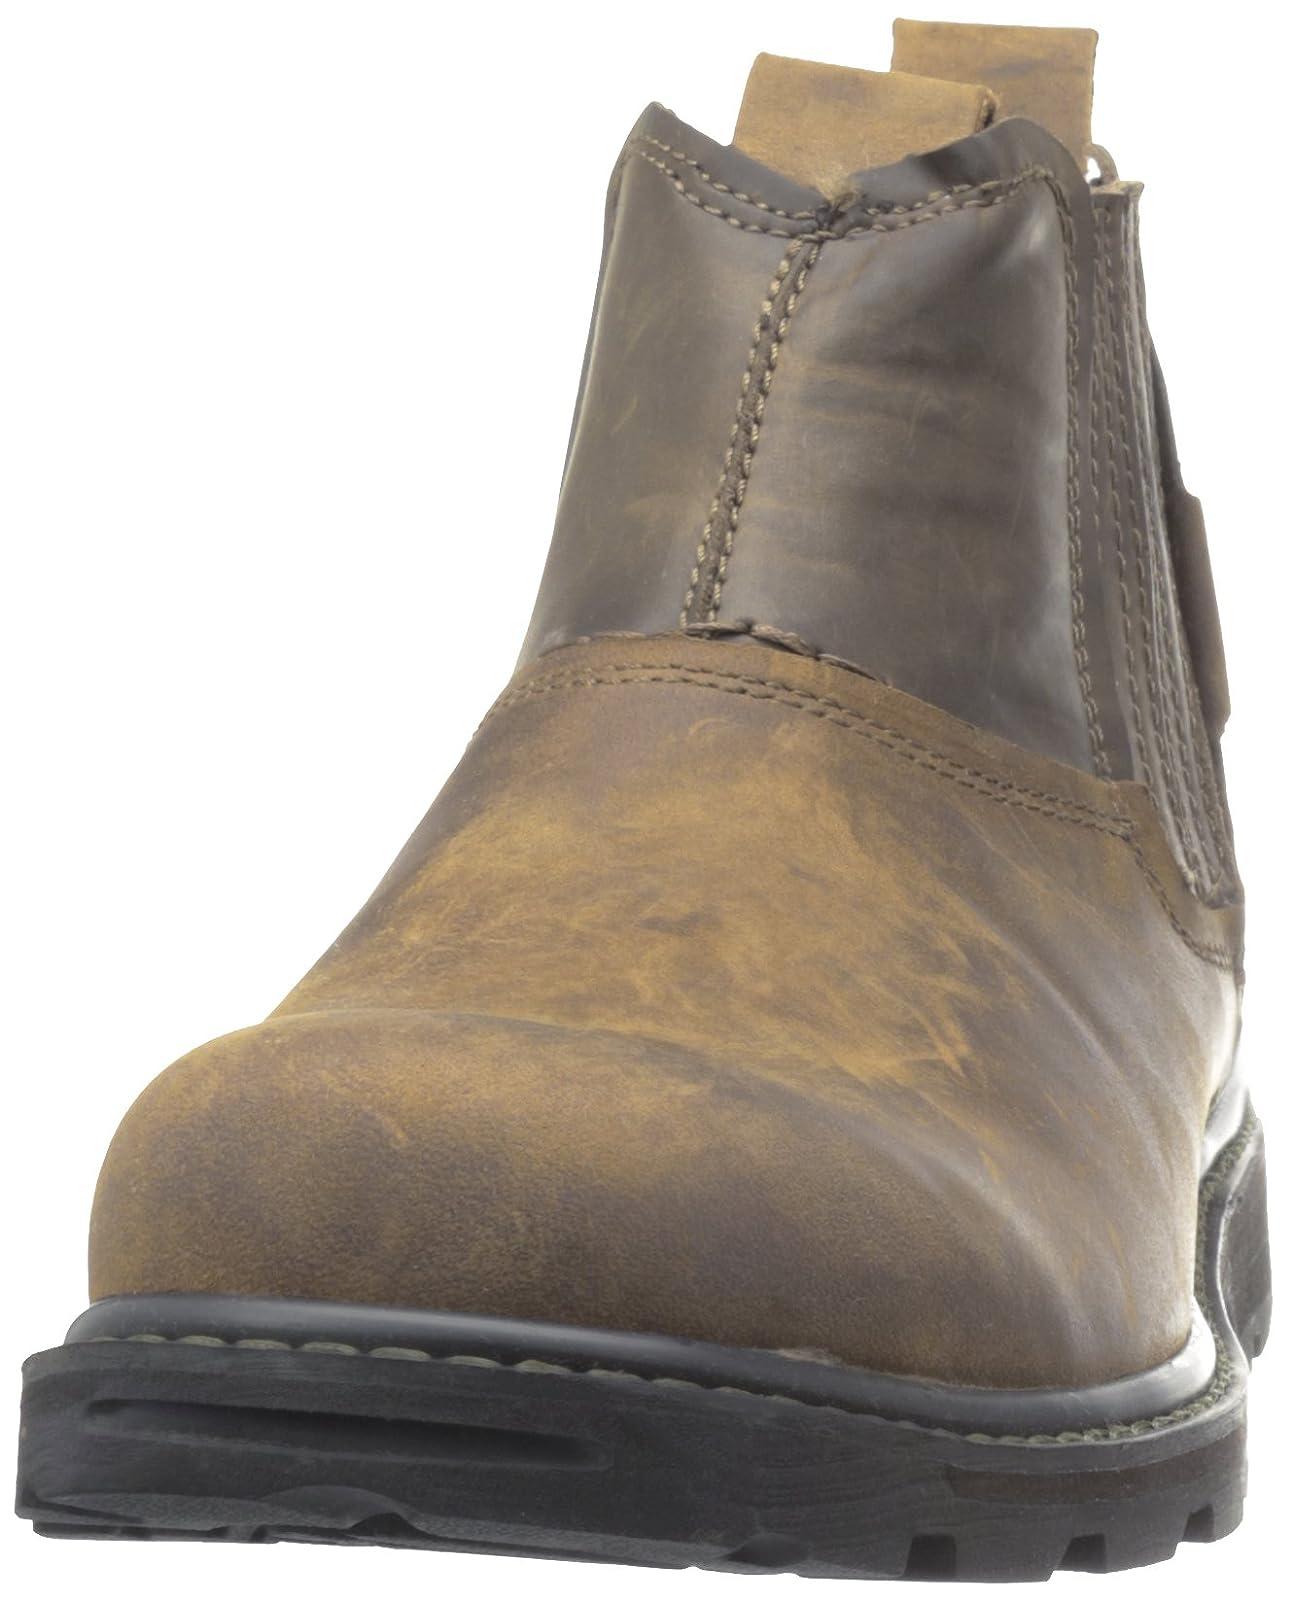 Skechers USA Men's Blaine Orsen Ankle Boot Dark Brown - 4